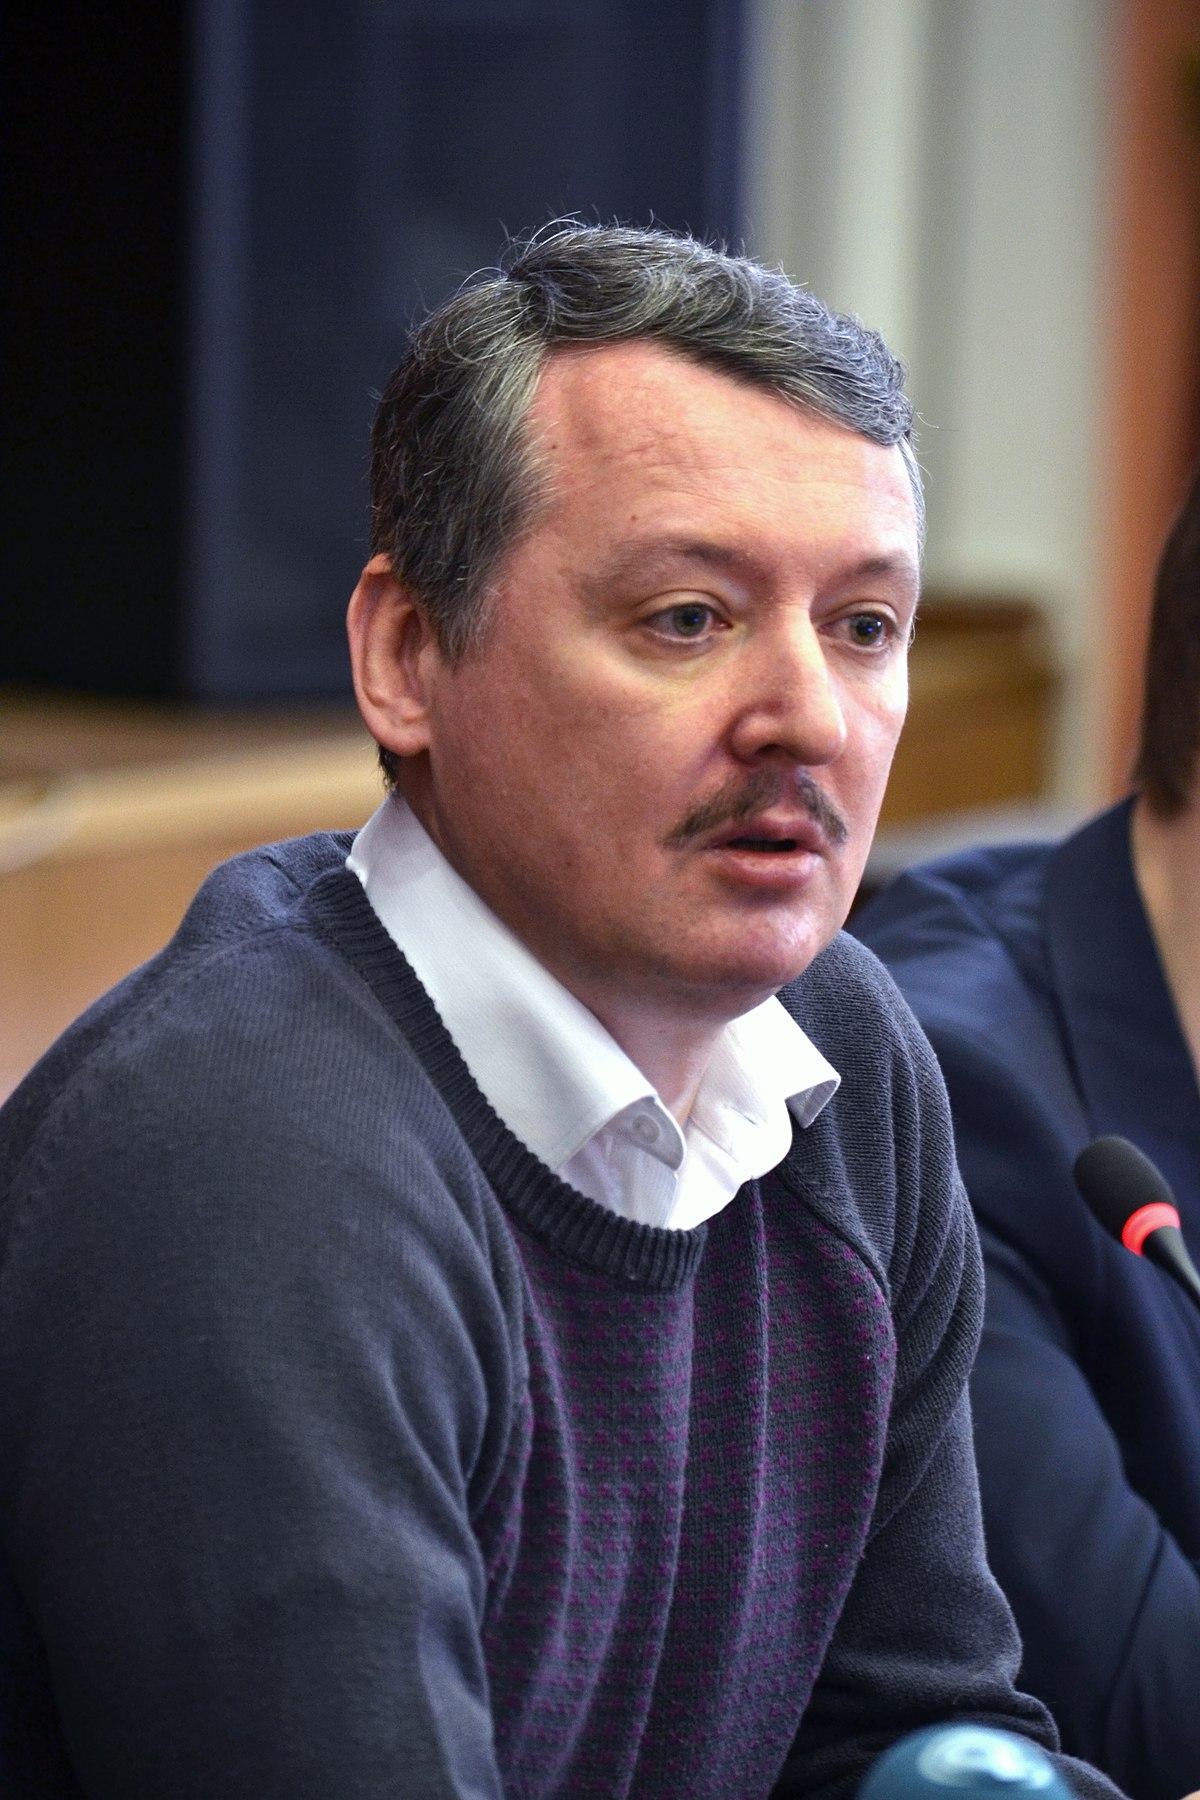 fb2 вячеслав пономарев славянск биография